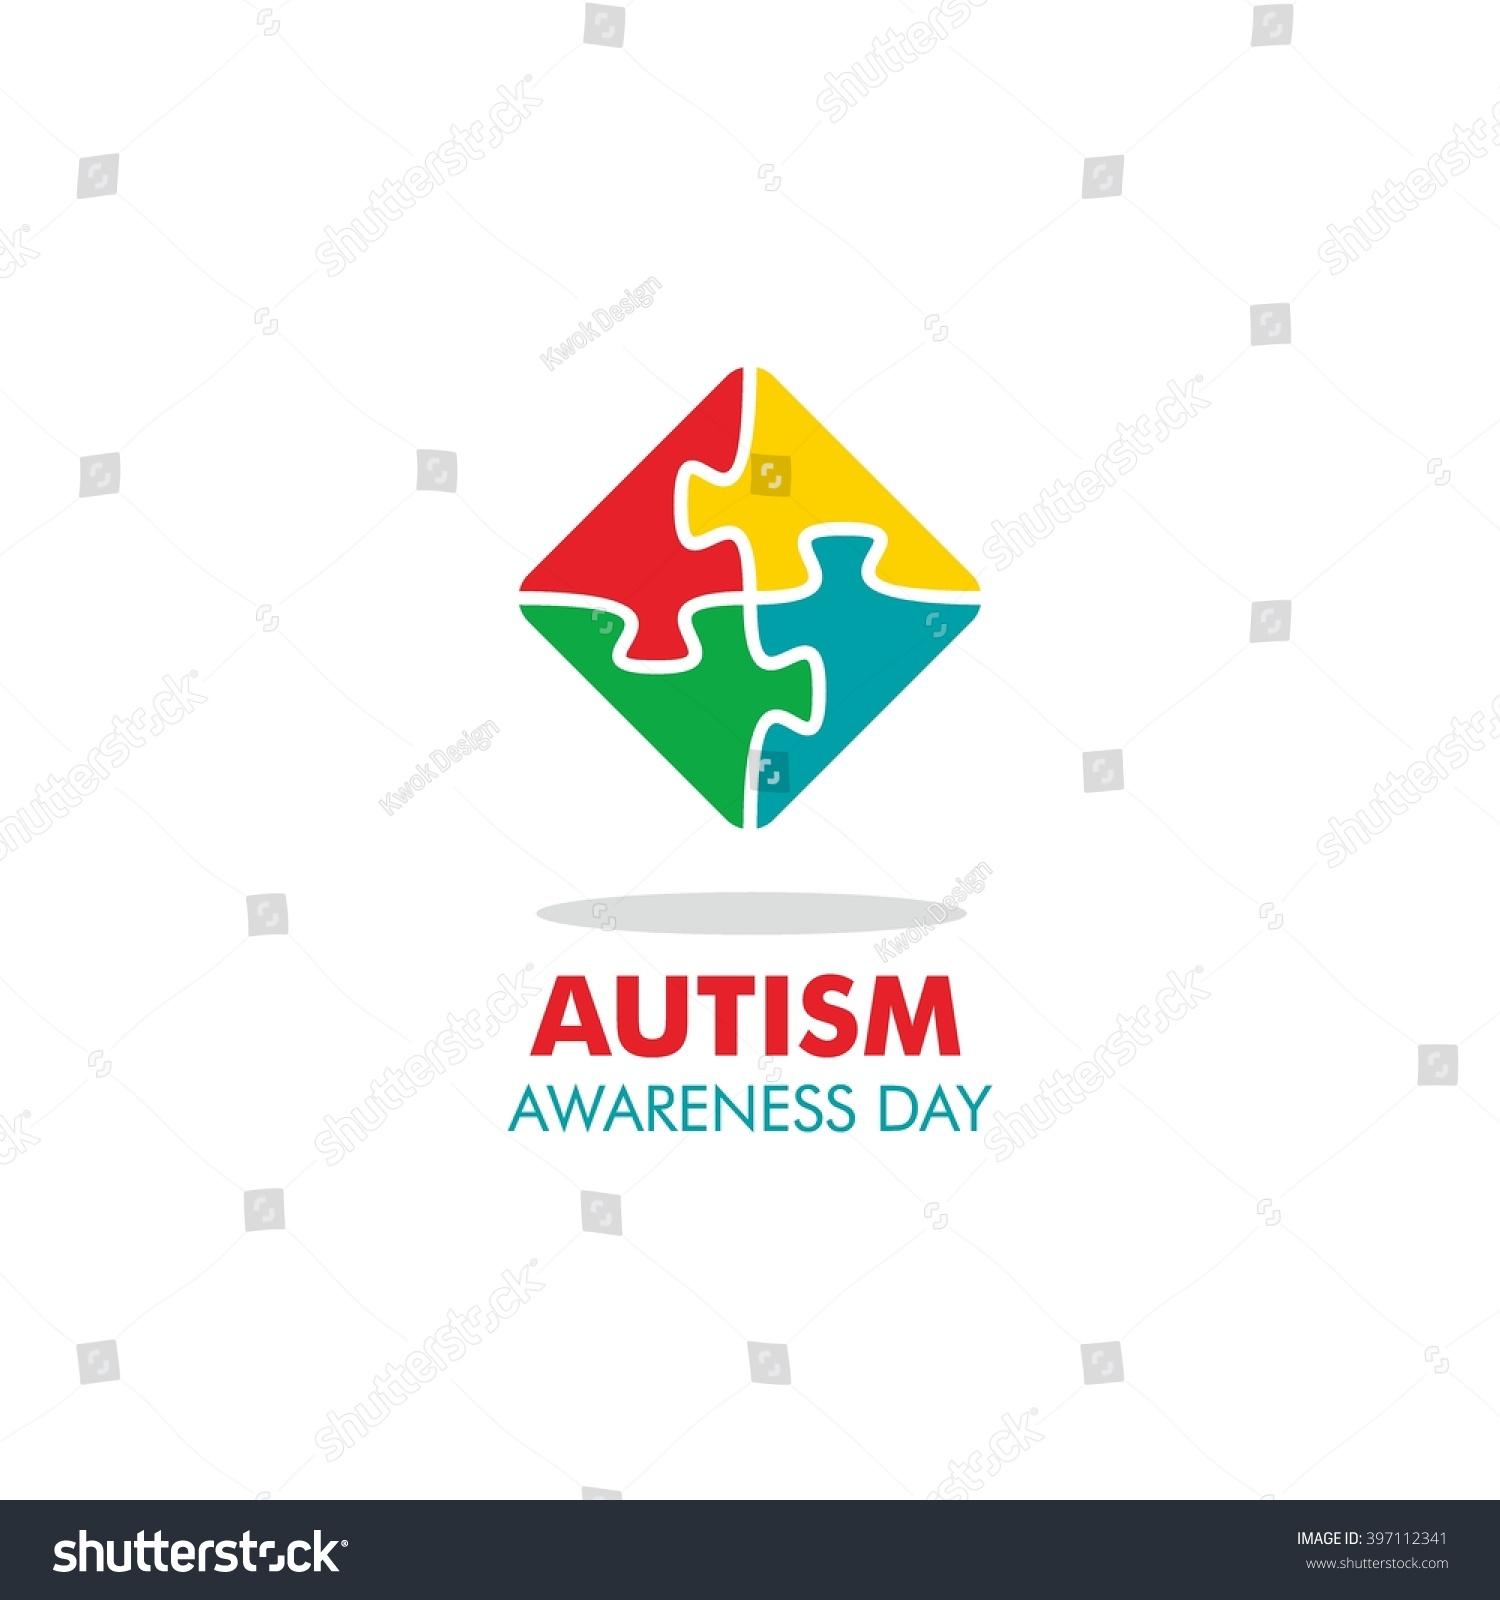 World autism awareness day logo design stock vector 397112341 world autism awareness day logo design template vector illustration colorful puzzles symbol biocorpaavc